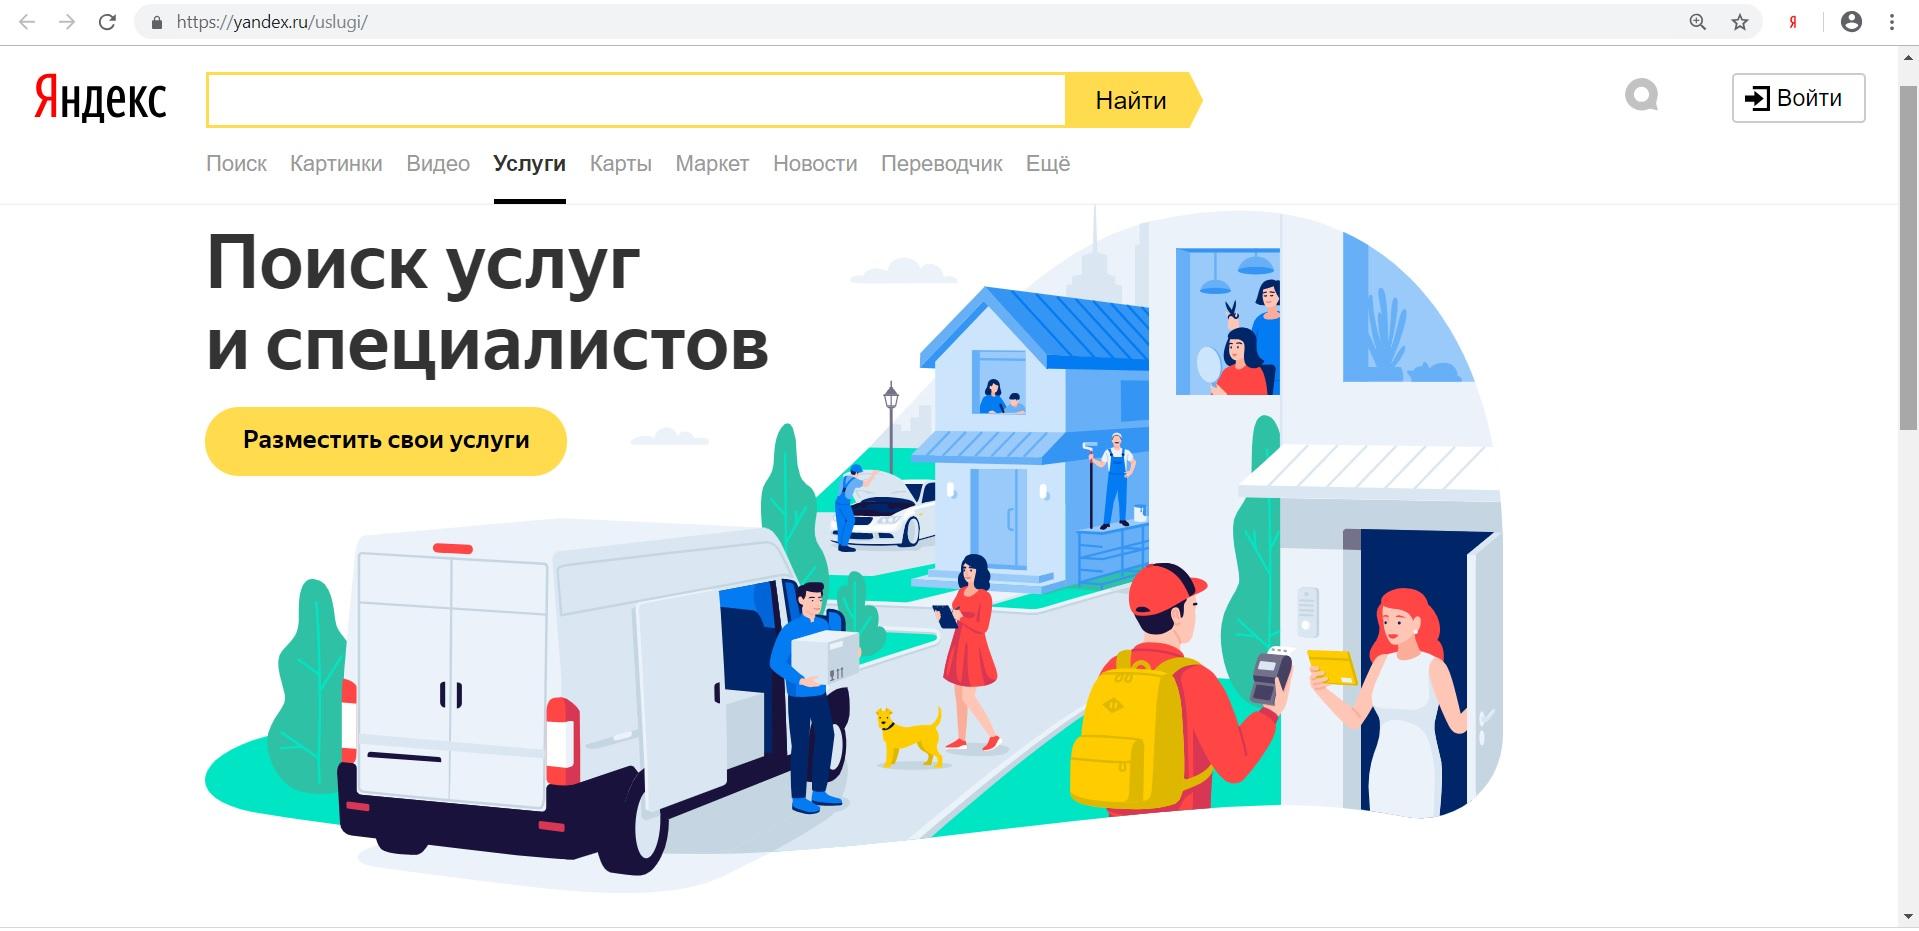 Yandex запустил новый сервис Яндекс.Услуги